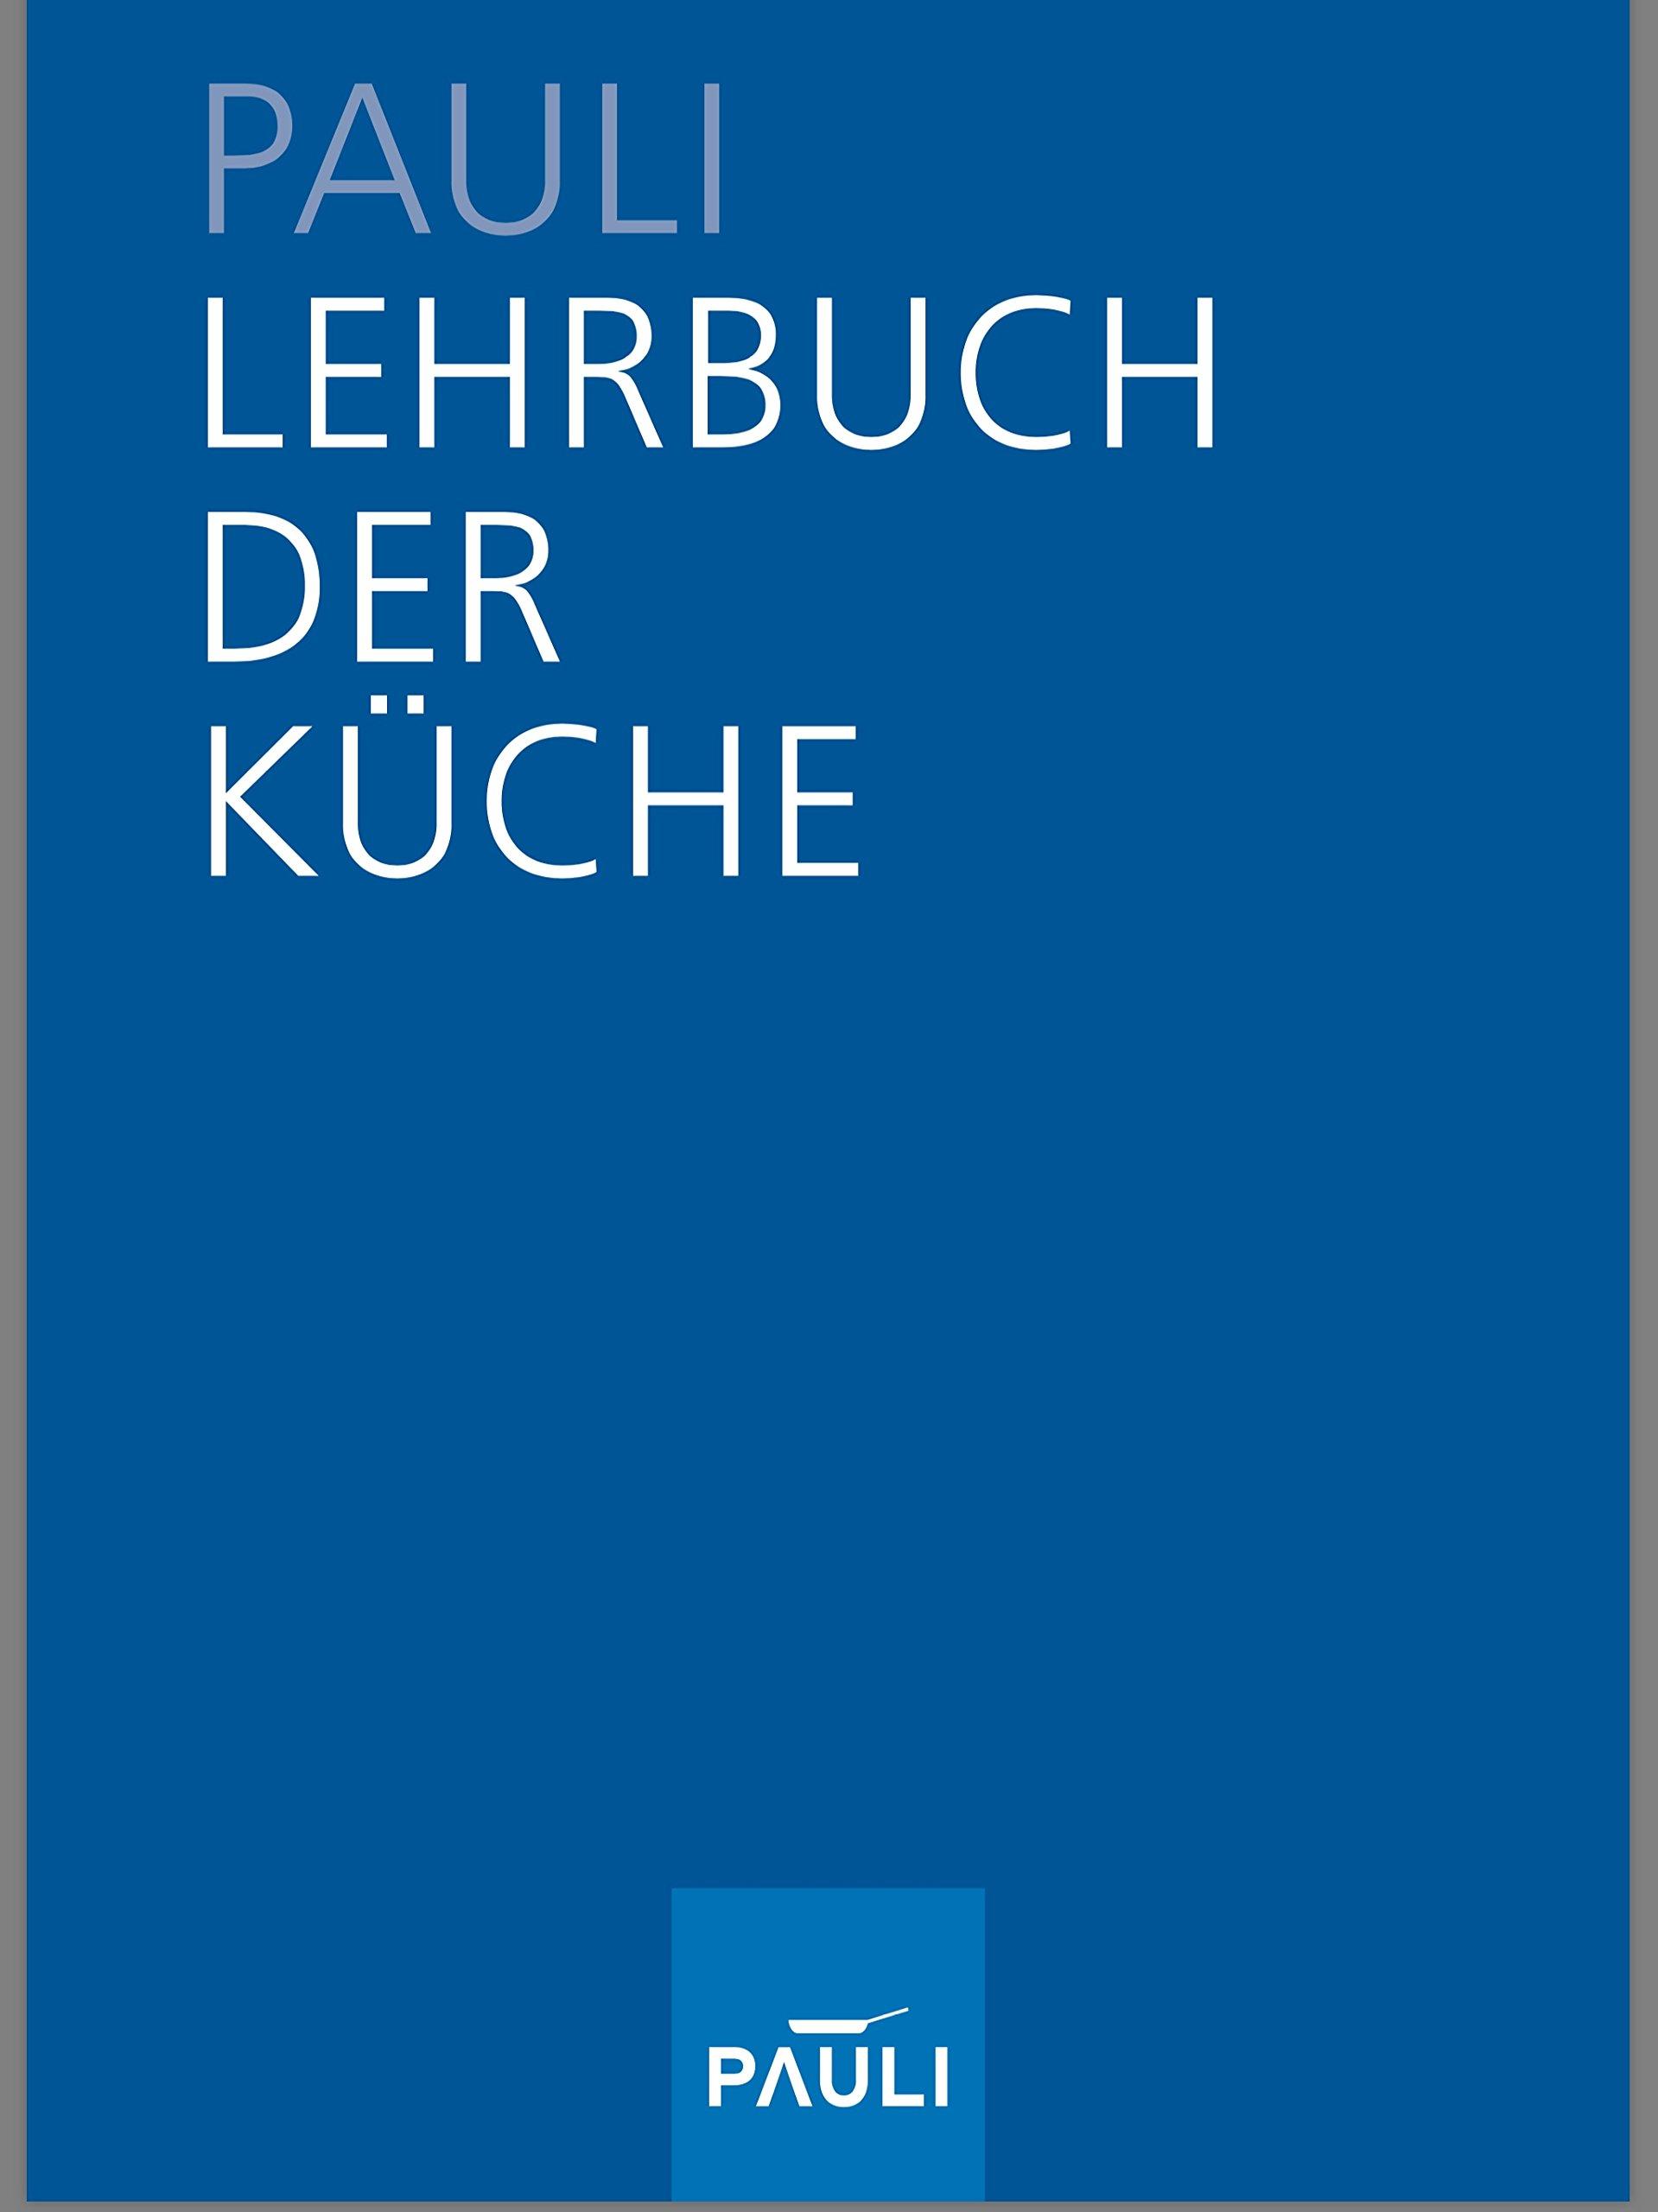 PAULI LEHRBUCH EPUB